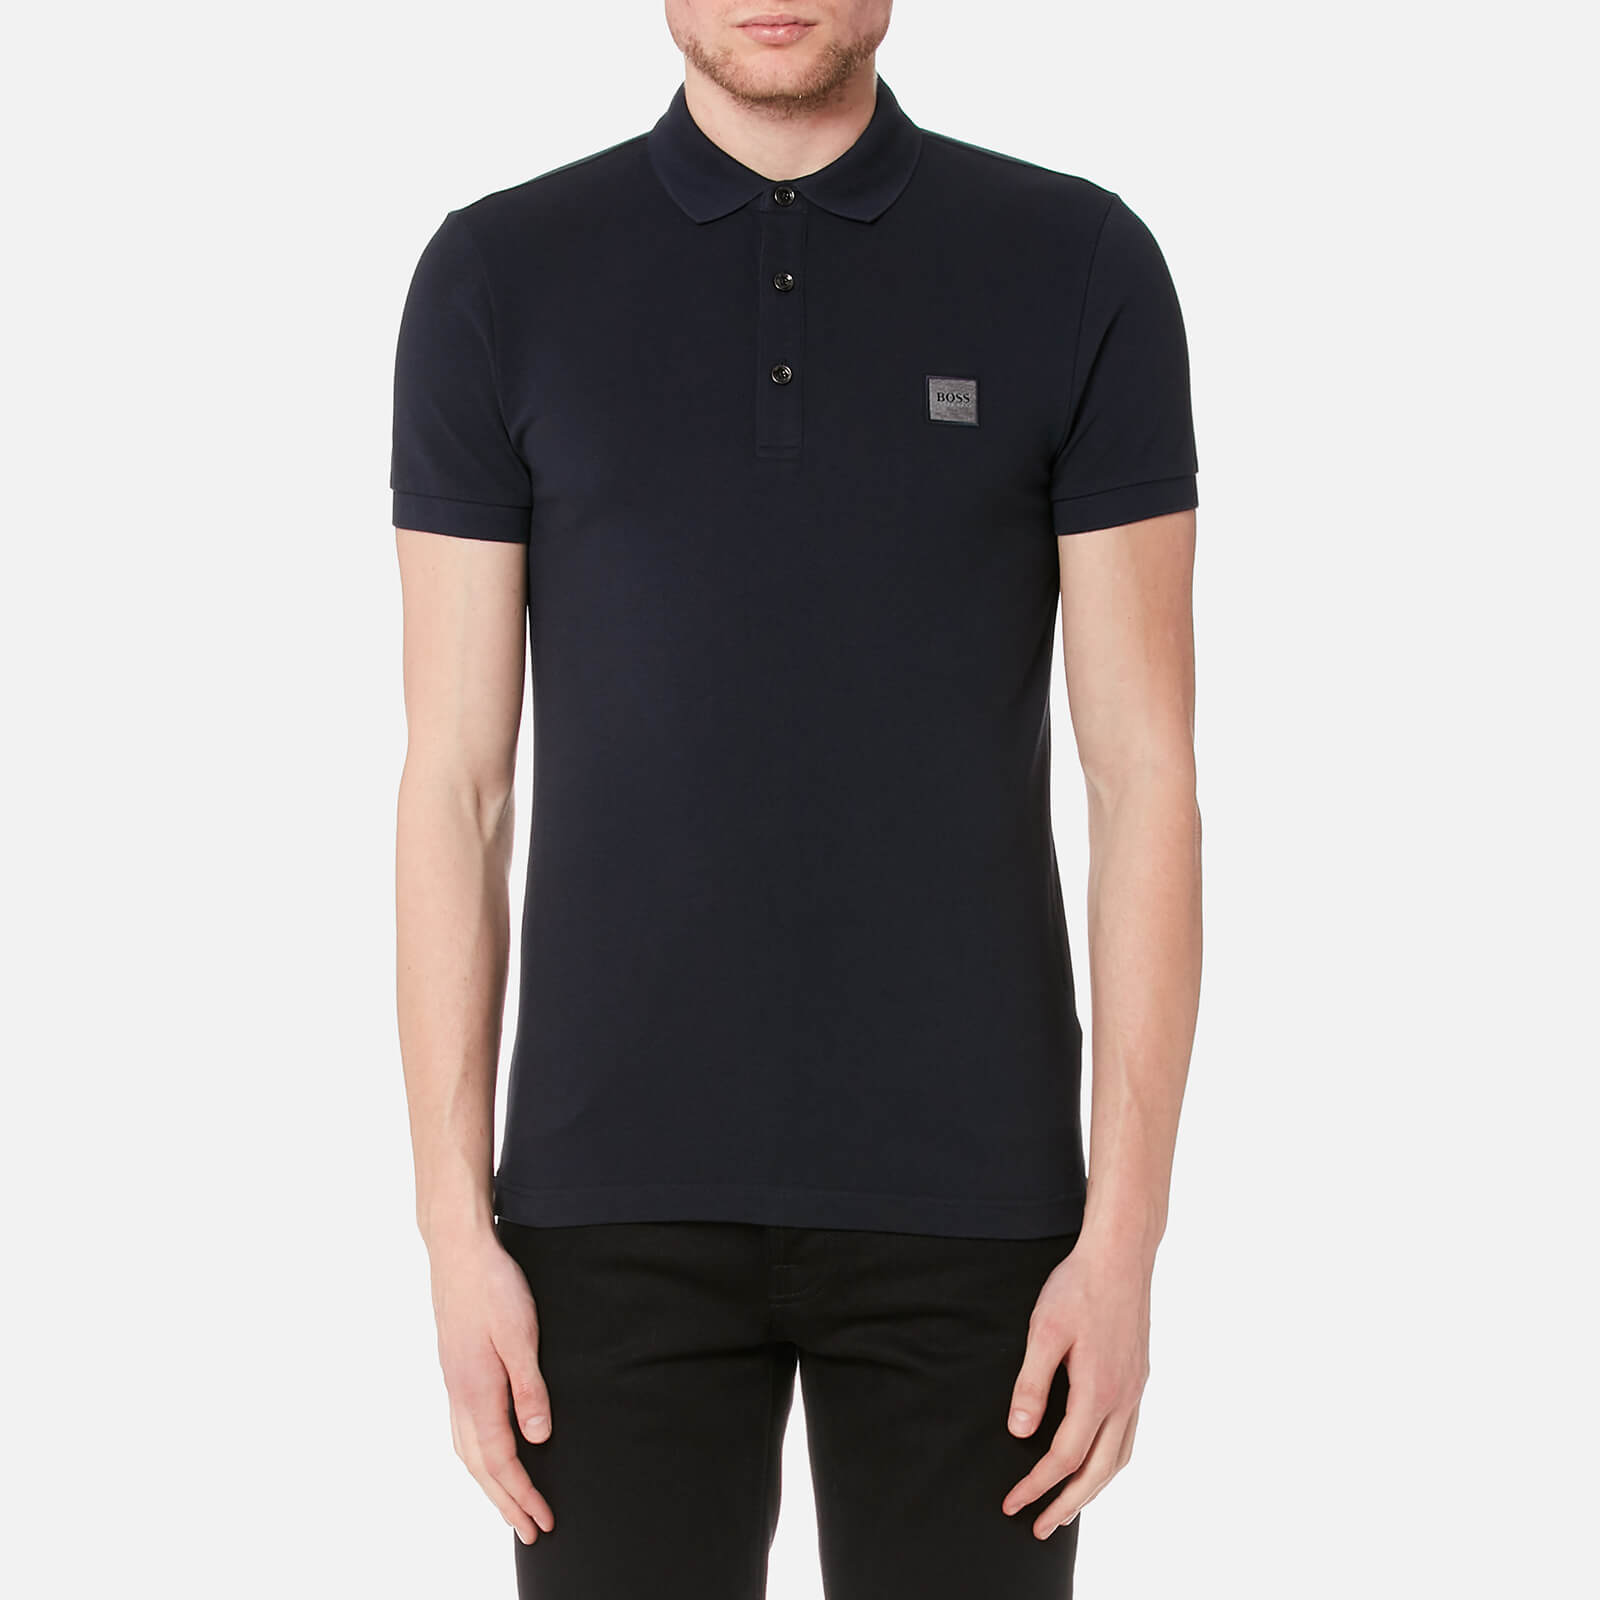 d43834c2 BOSS Men's Passenger Polo Shirt - Navy Clothing   TheHut.com